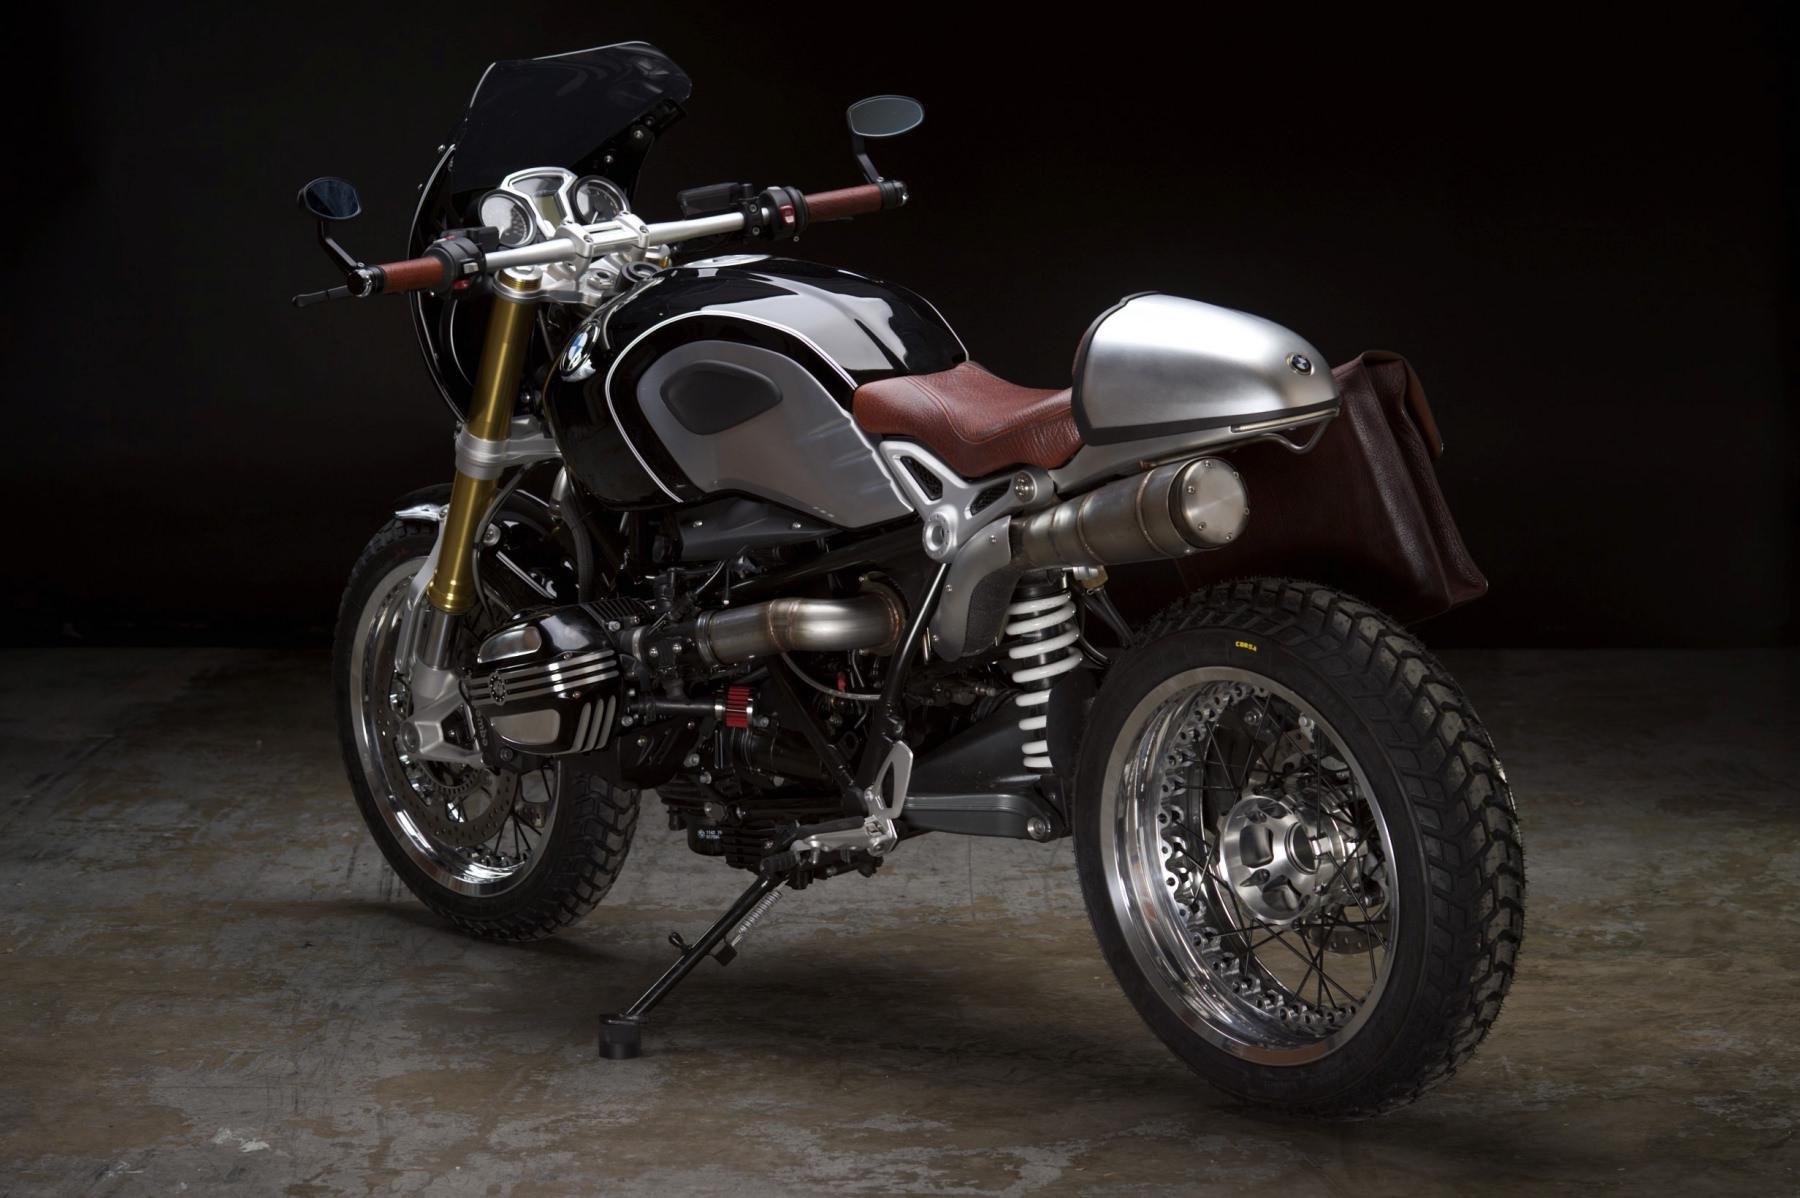 Ducati Parts Online Review